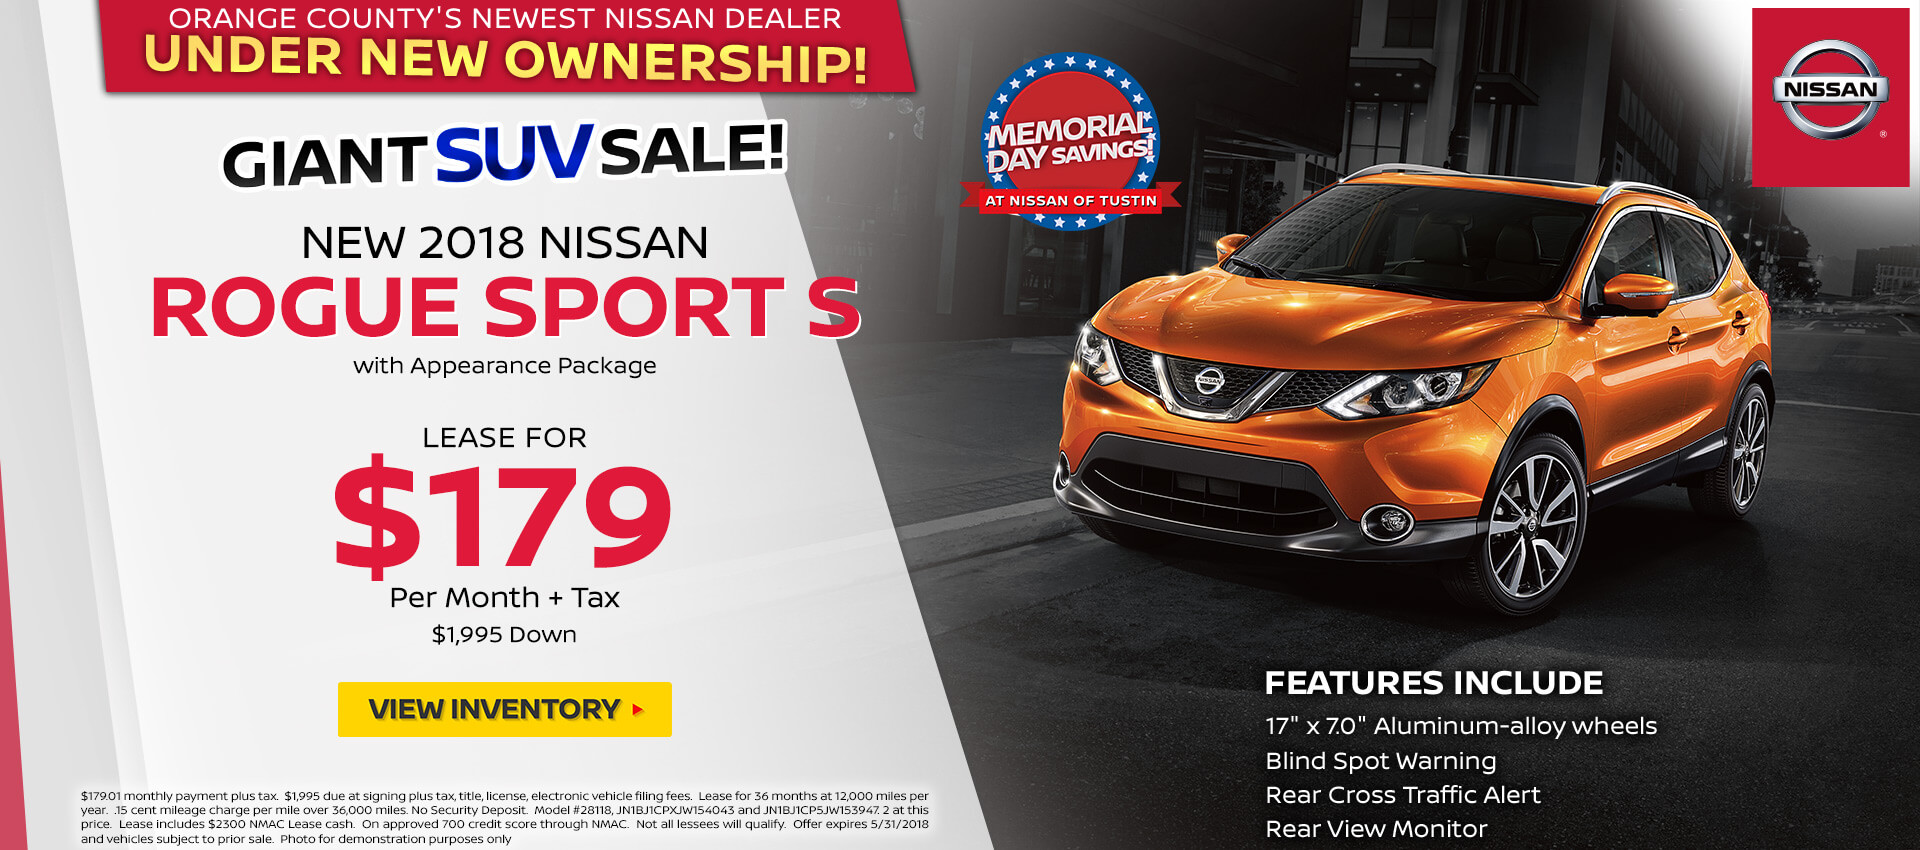 2018 Nissan Rogue Sport $179 Lease